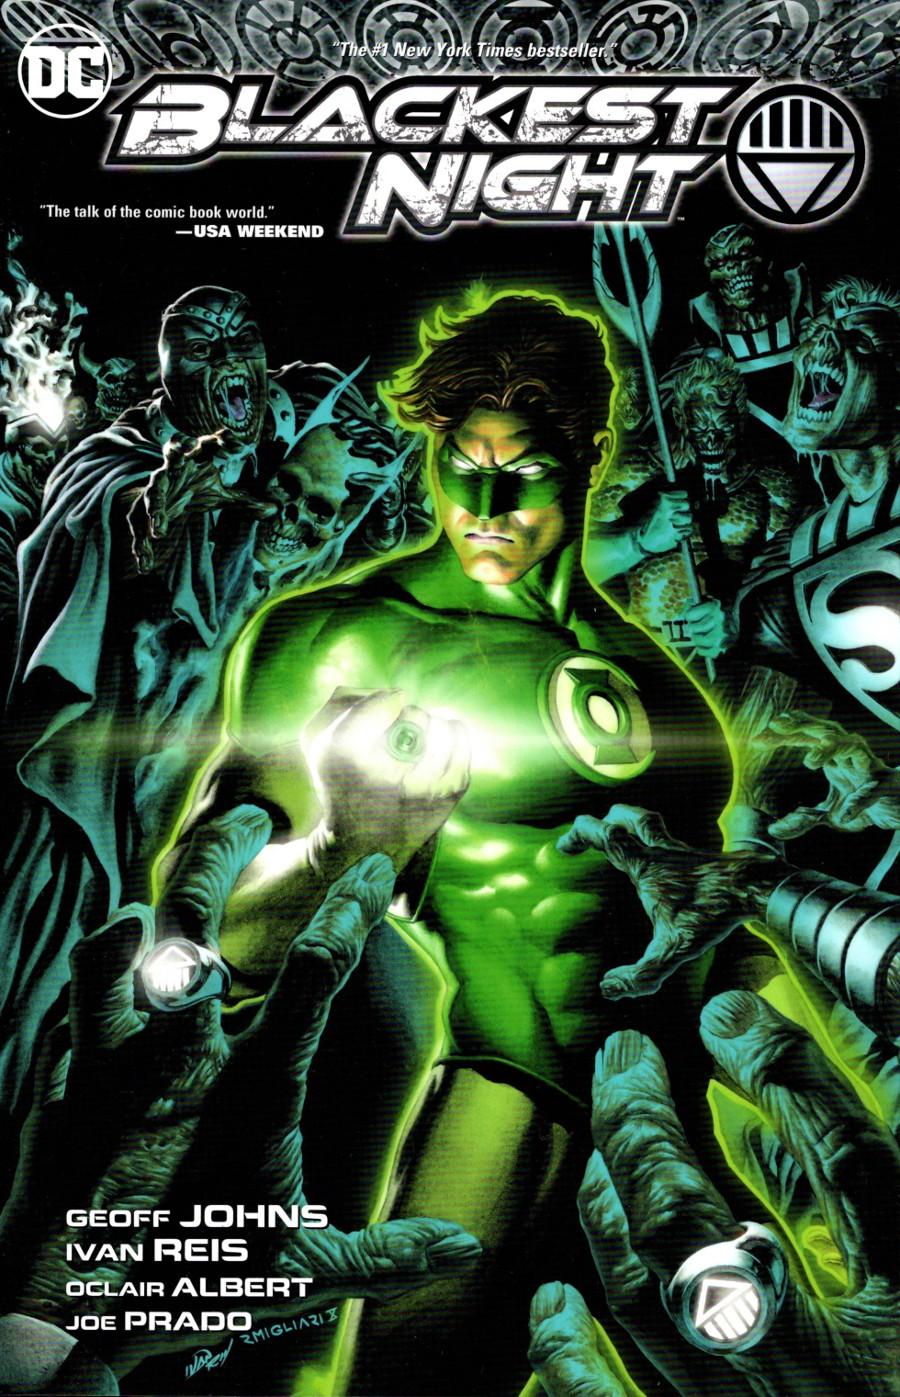 Green Lantern DC Comics Blackest Night